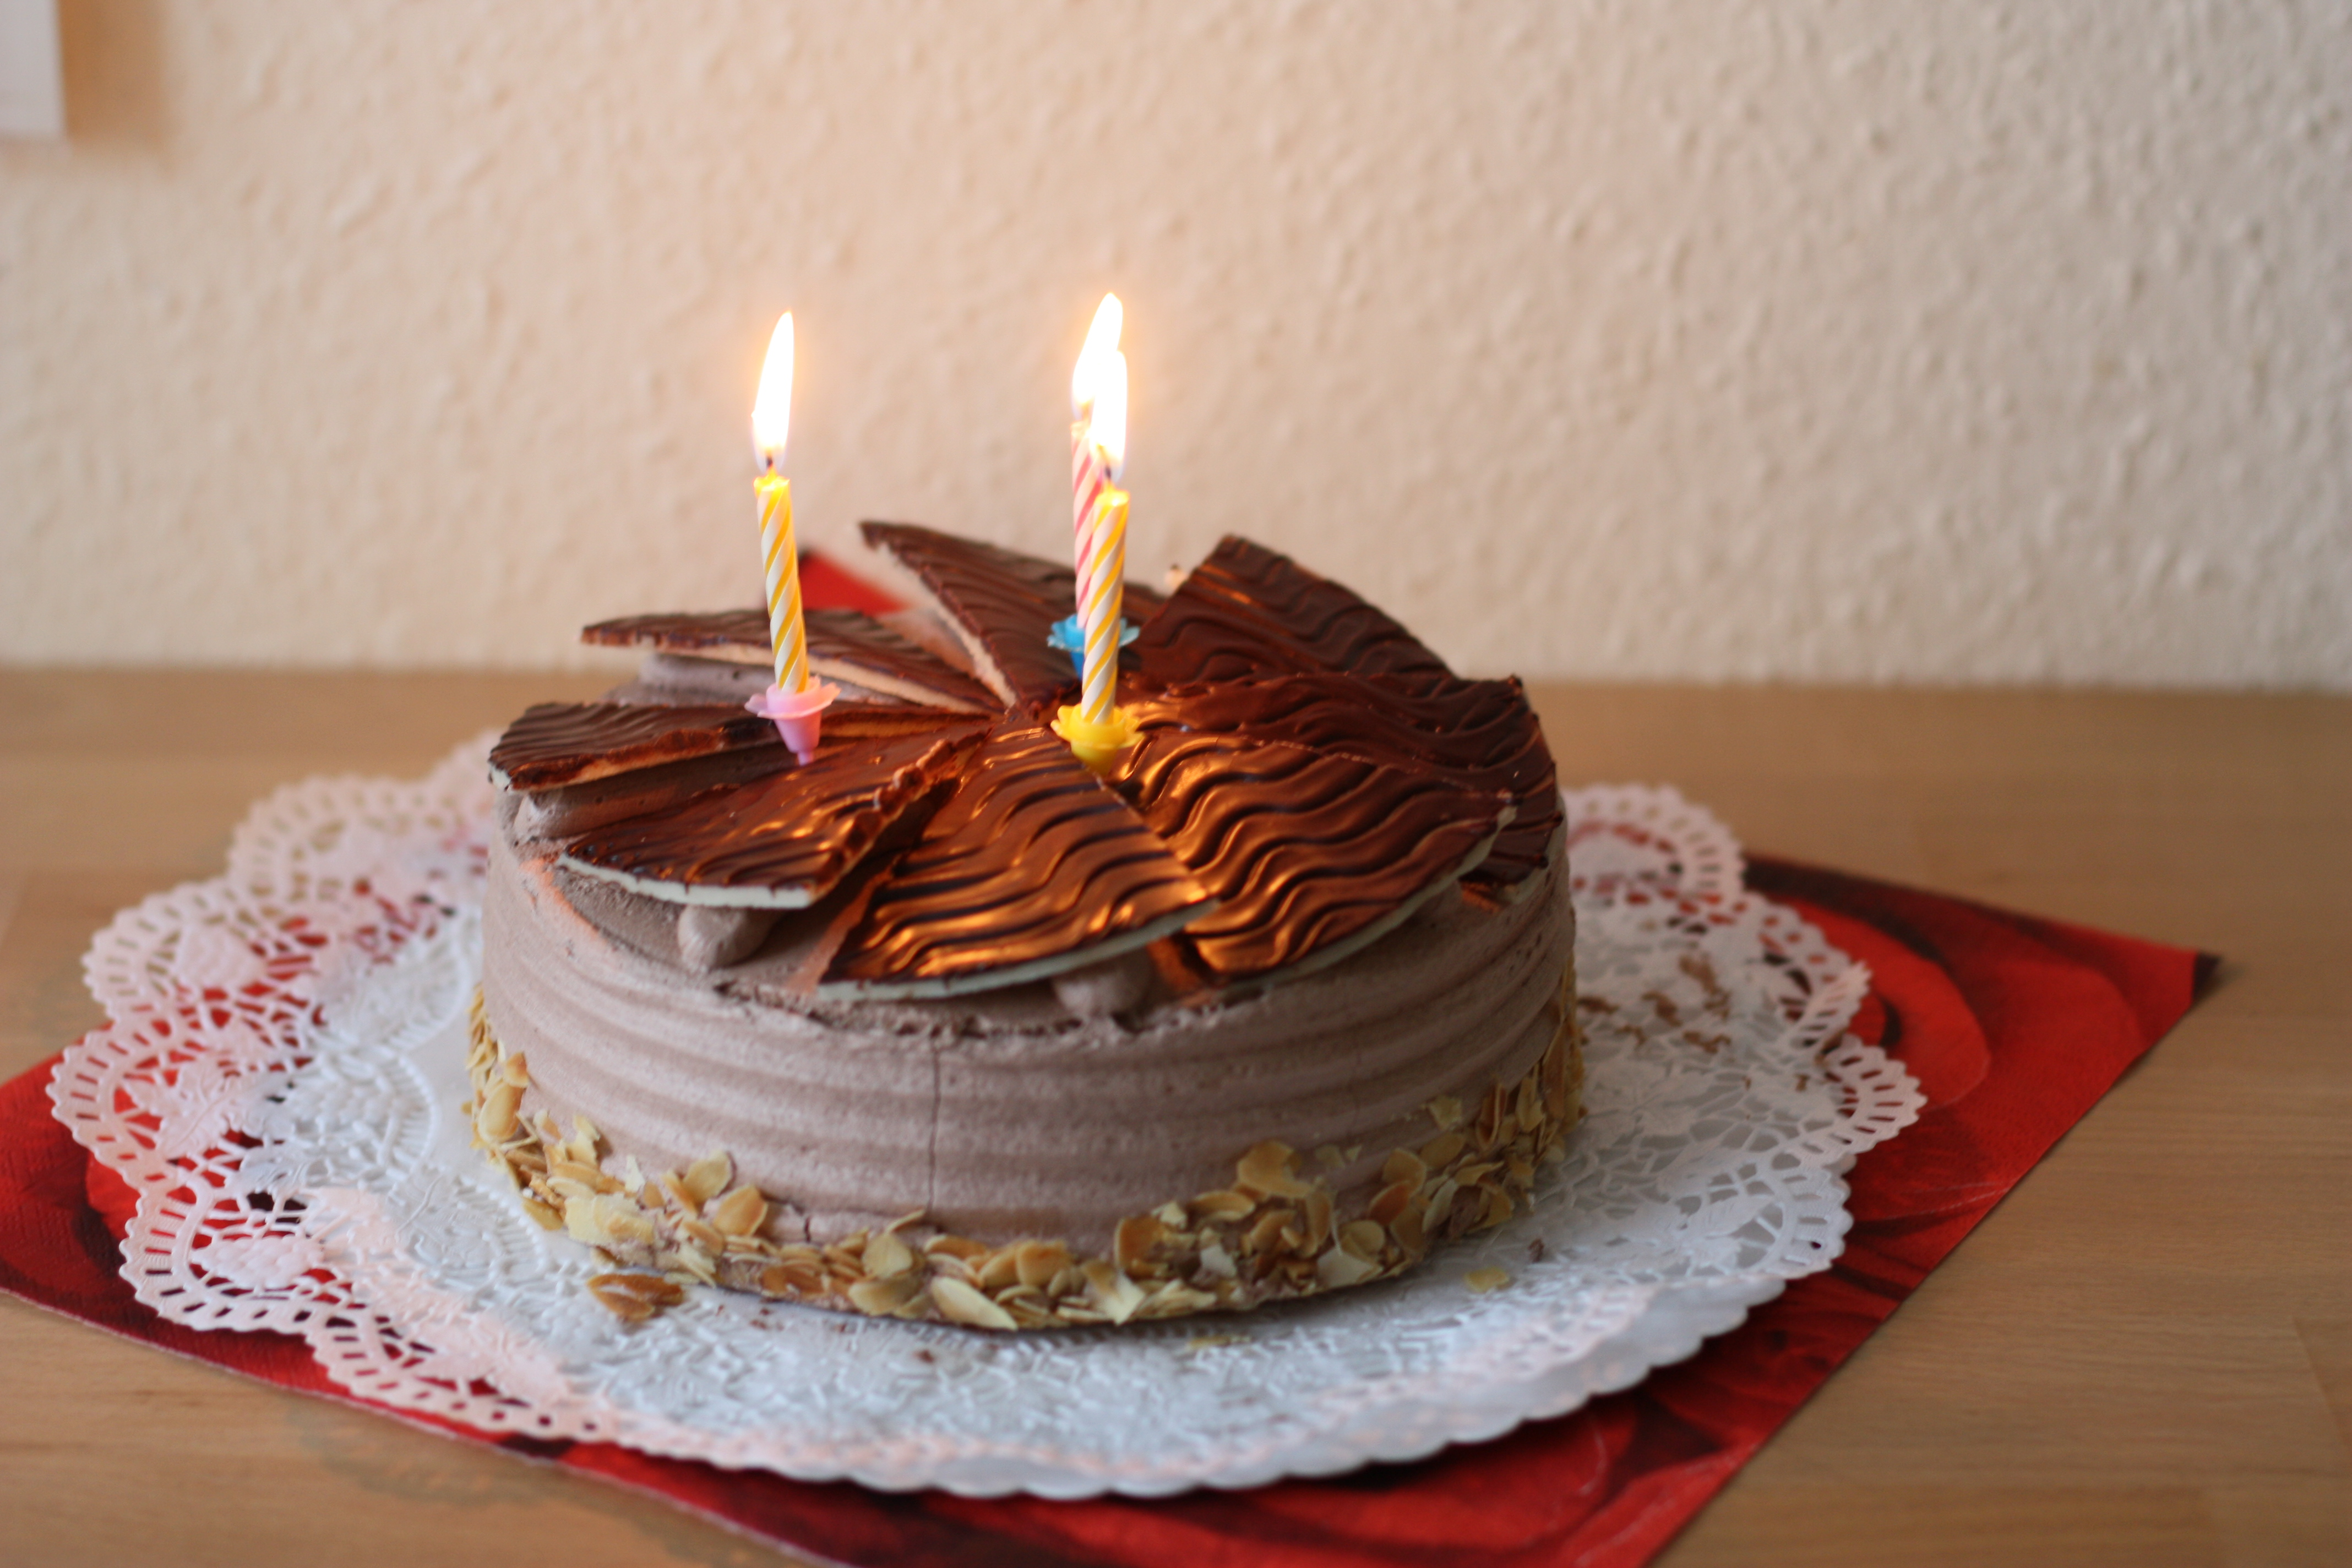 File Schokoladentorte Buttercreme Tulpen Dritter Geburtstag 002 Jpg